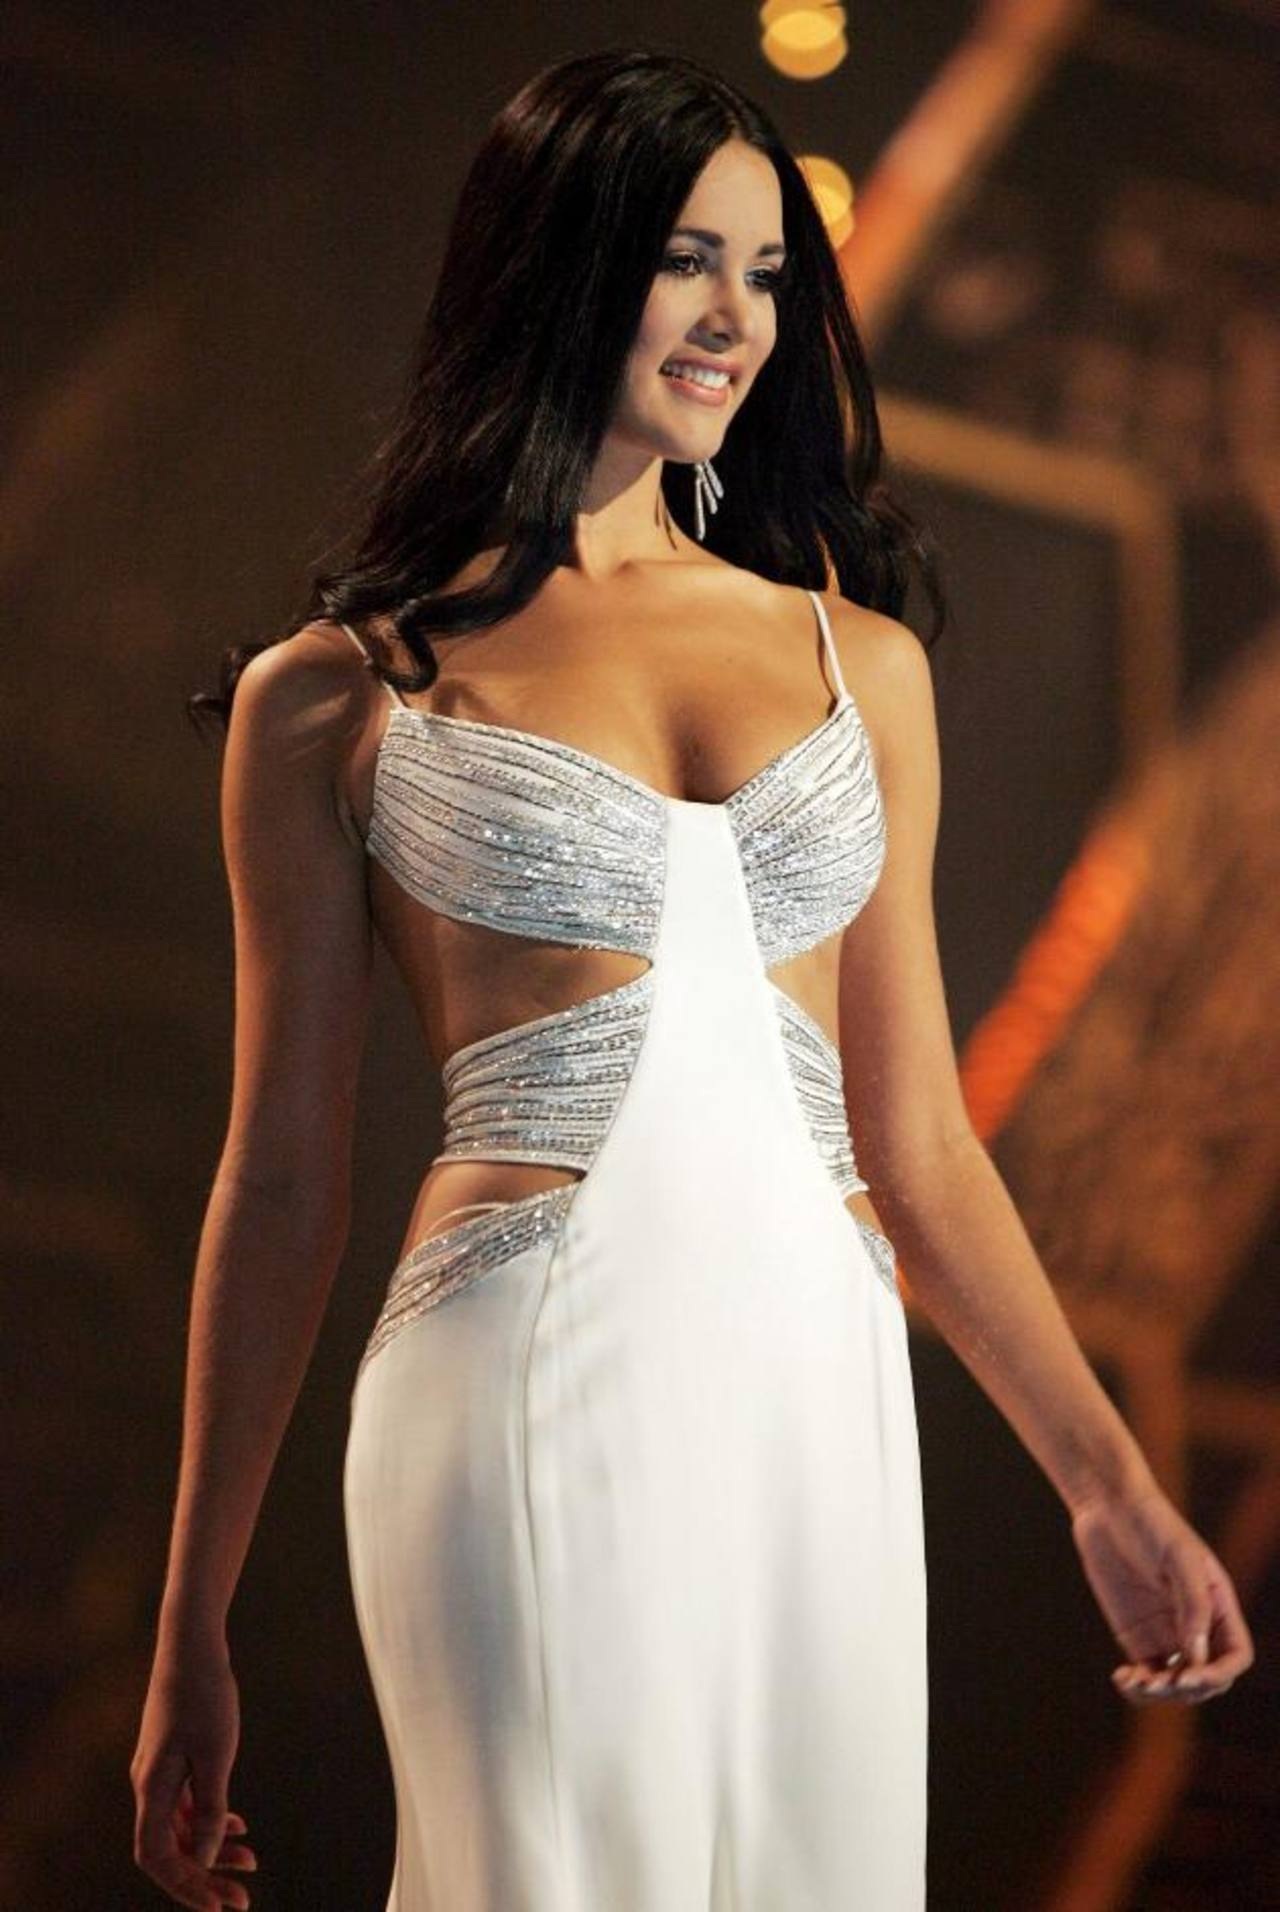 Mónica Spears durante su participación en Miss Universo 2005. Fotos EDH /